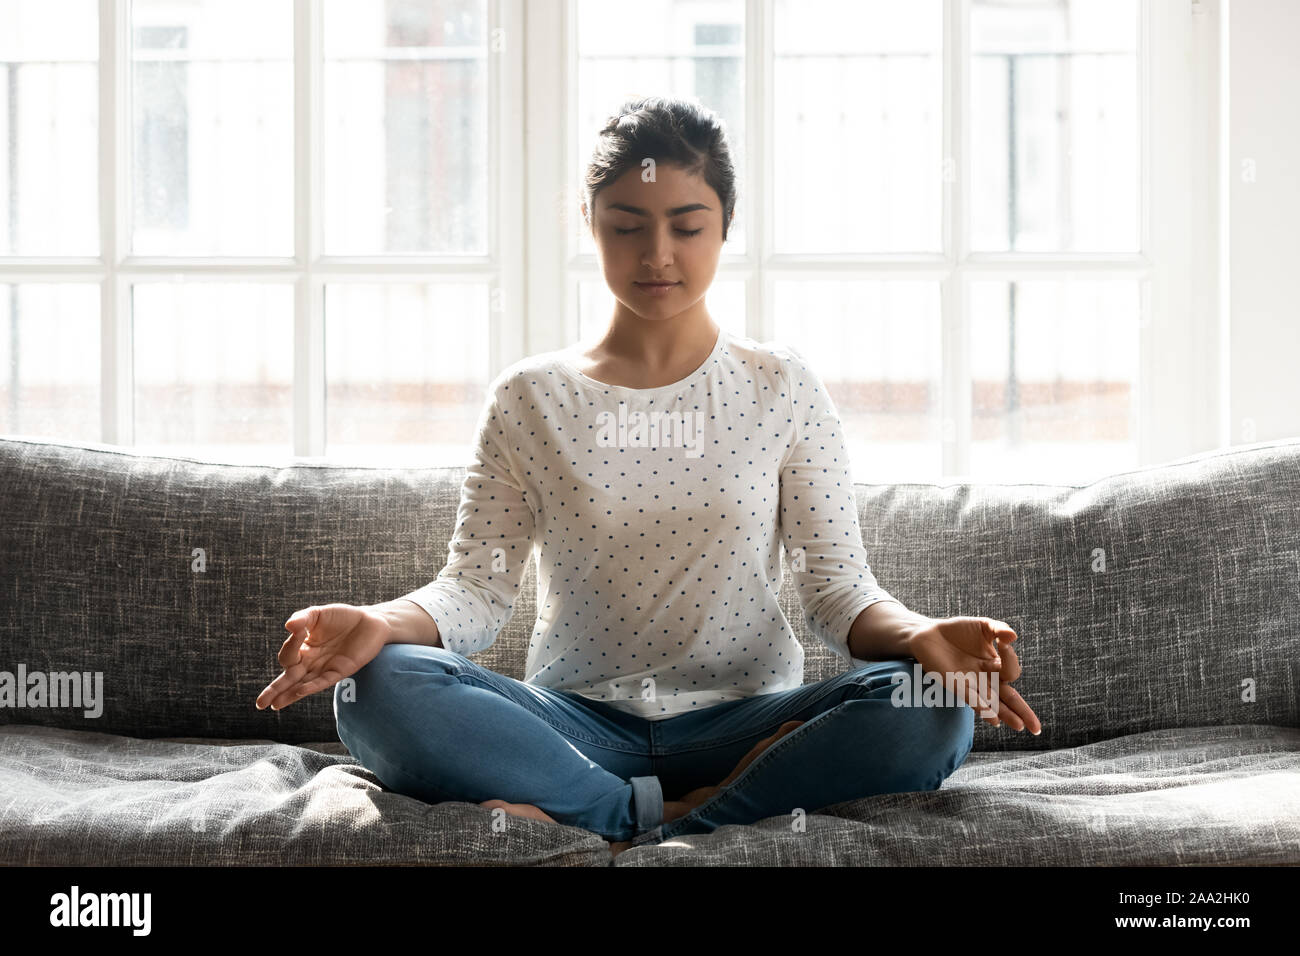 Mindful Young Indian Woman Doing Breathing Yoga Exercises Alone Stock Photo Alamy